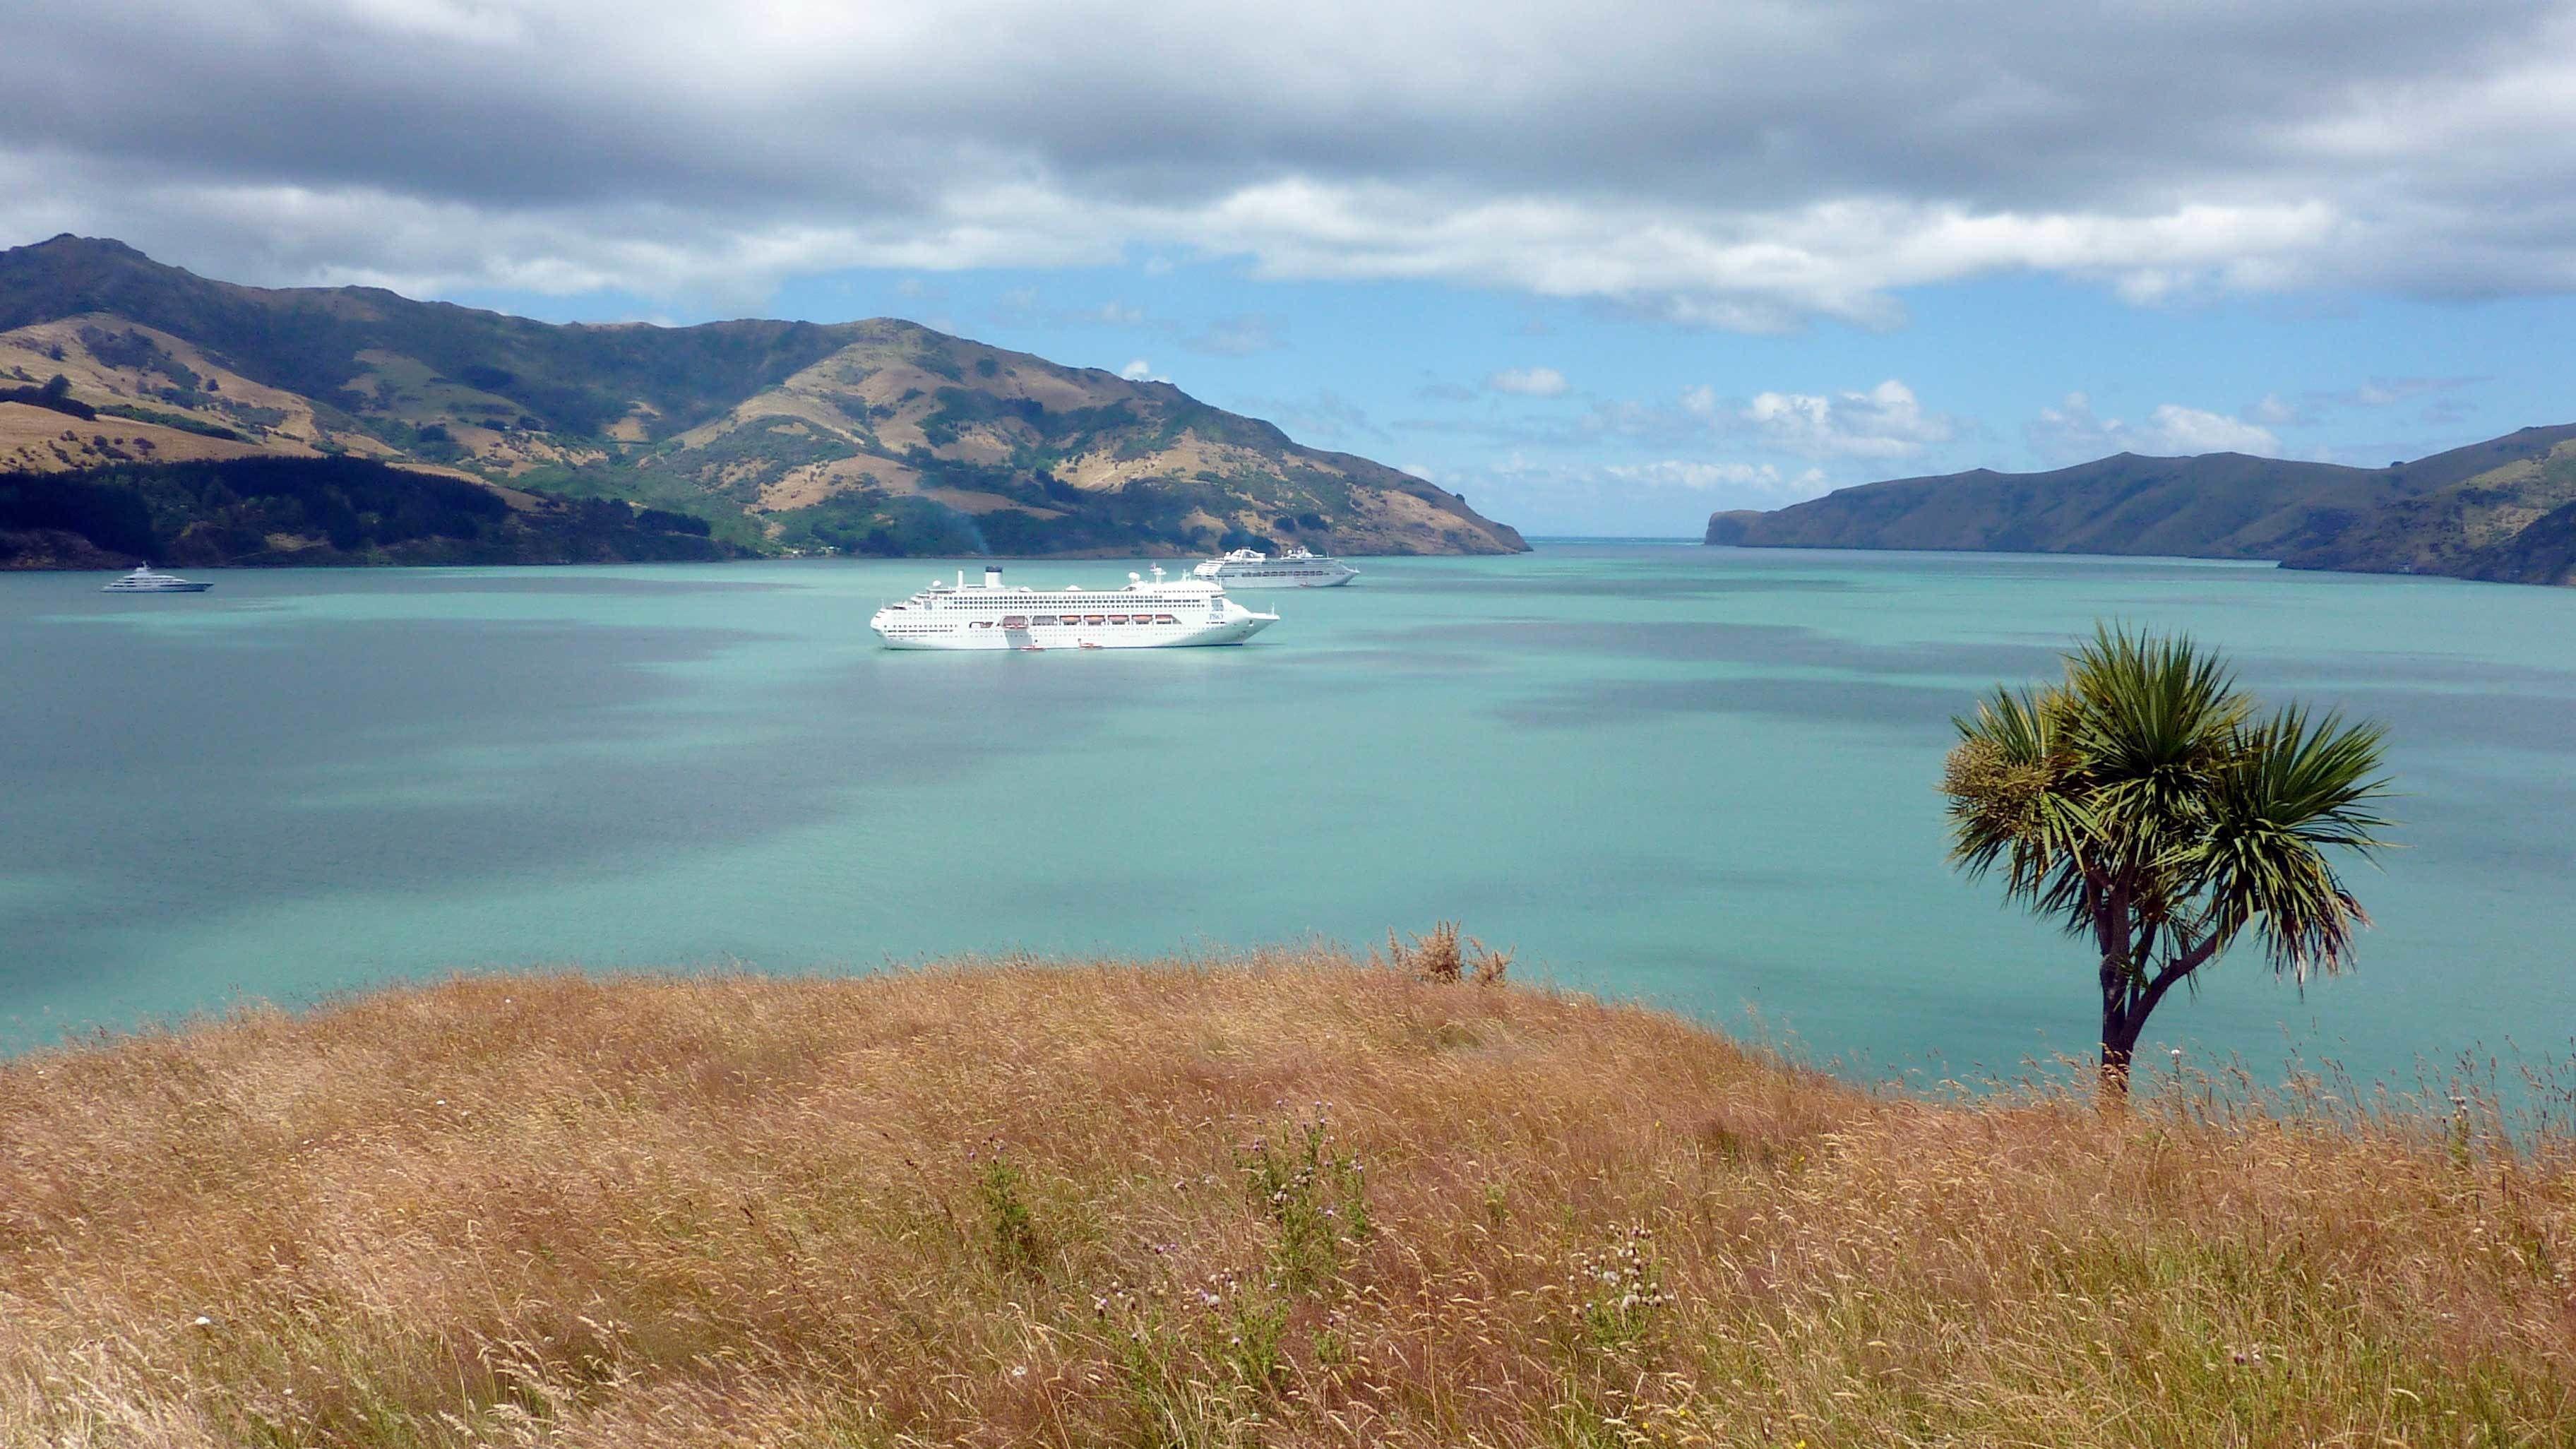 Akaroa Cruise Excursion - Christchurch City Sightseeing & Farm Tour